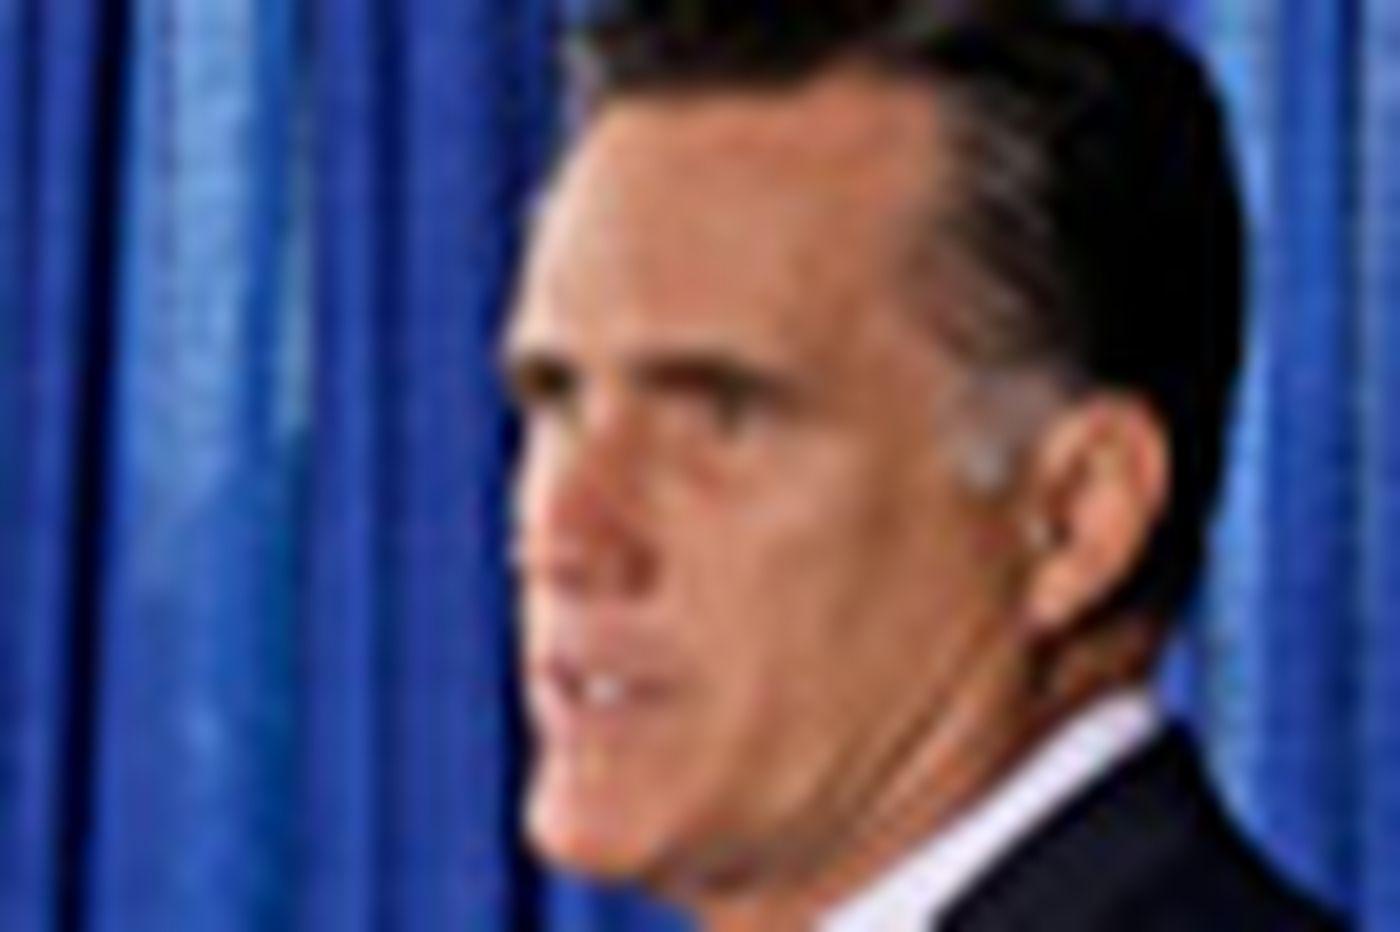 Romney denounces film aimed at Muslims